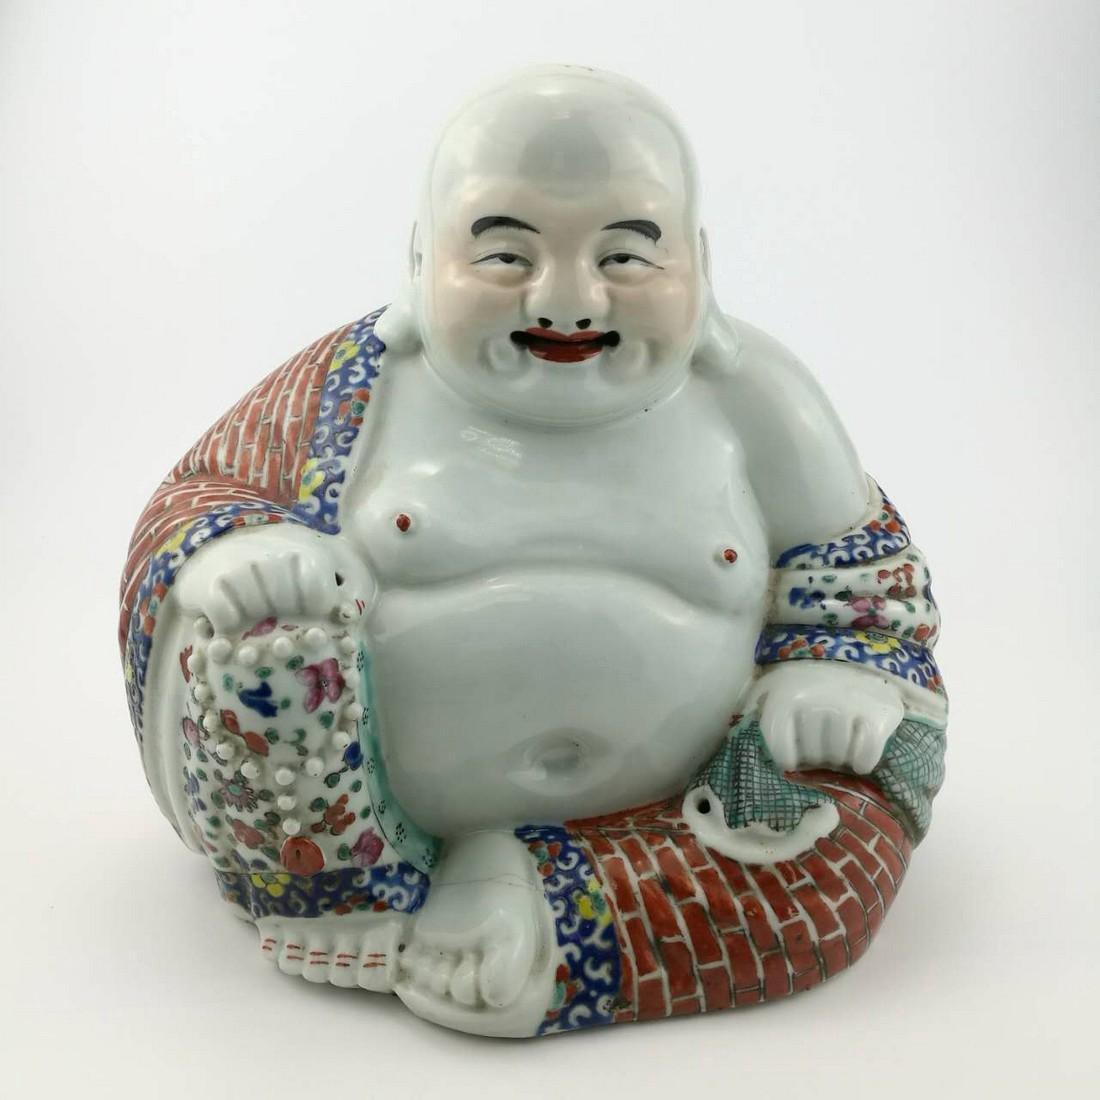 19th Century Chinese Porcelain BUDAI Buddha Sculpture